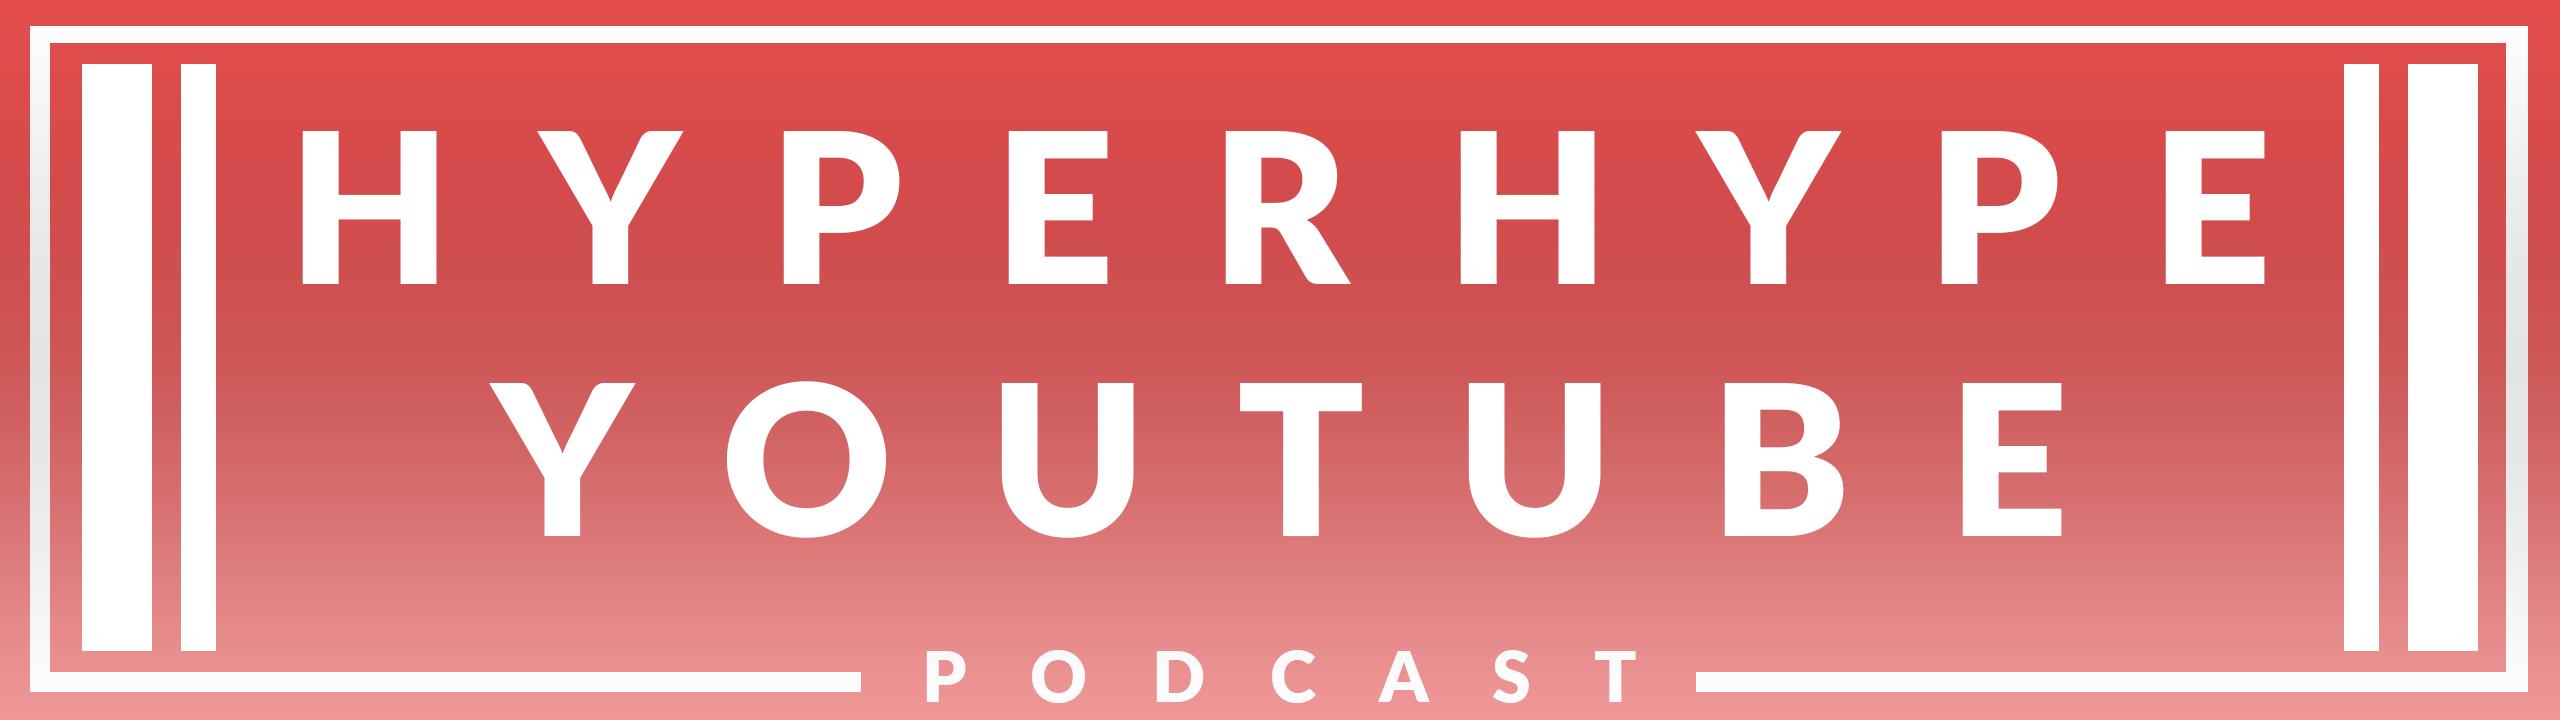 HyperHype-Podcast-Youtube